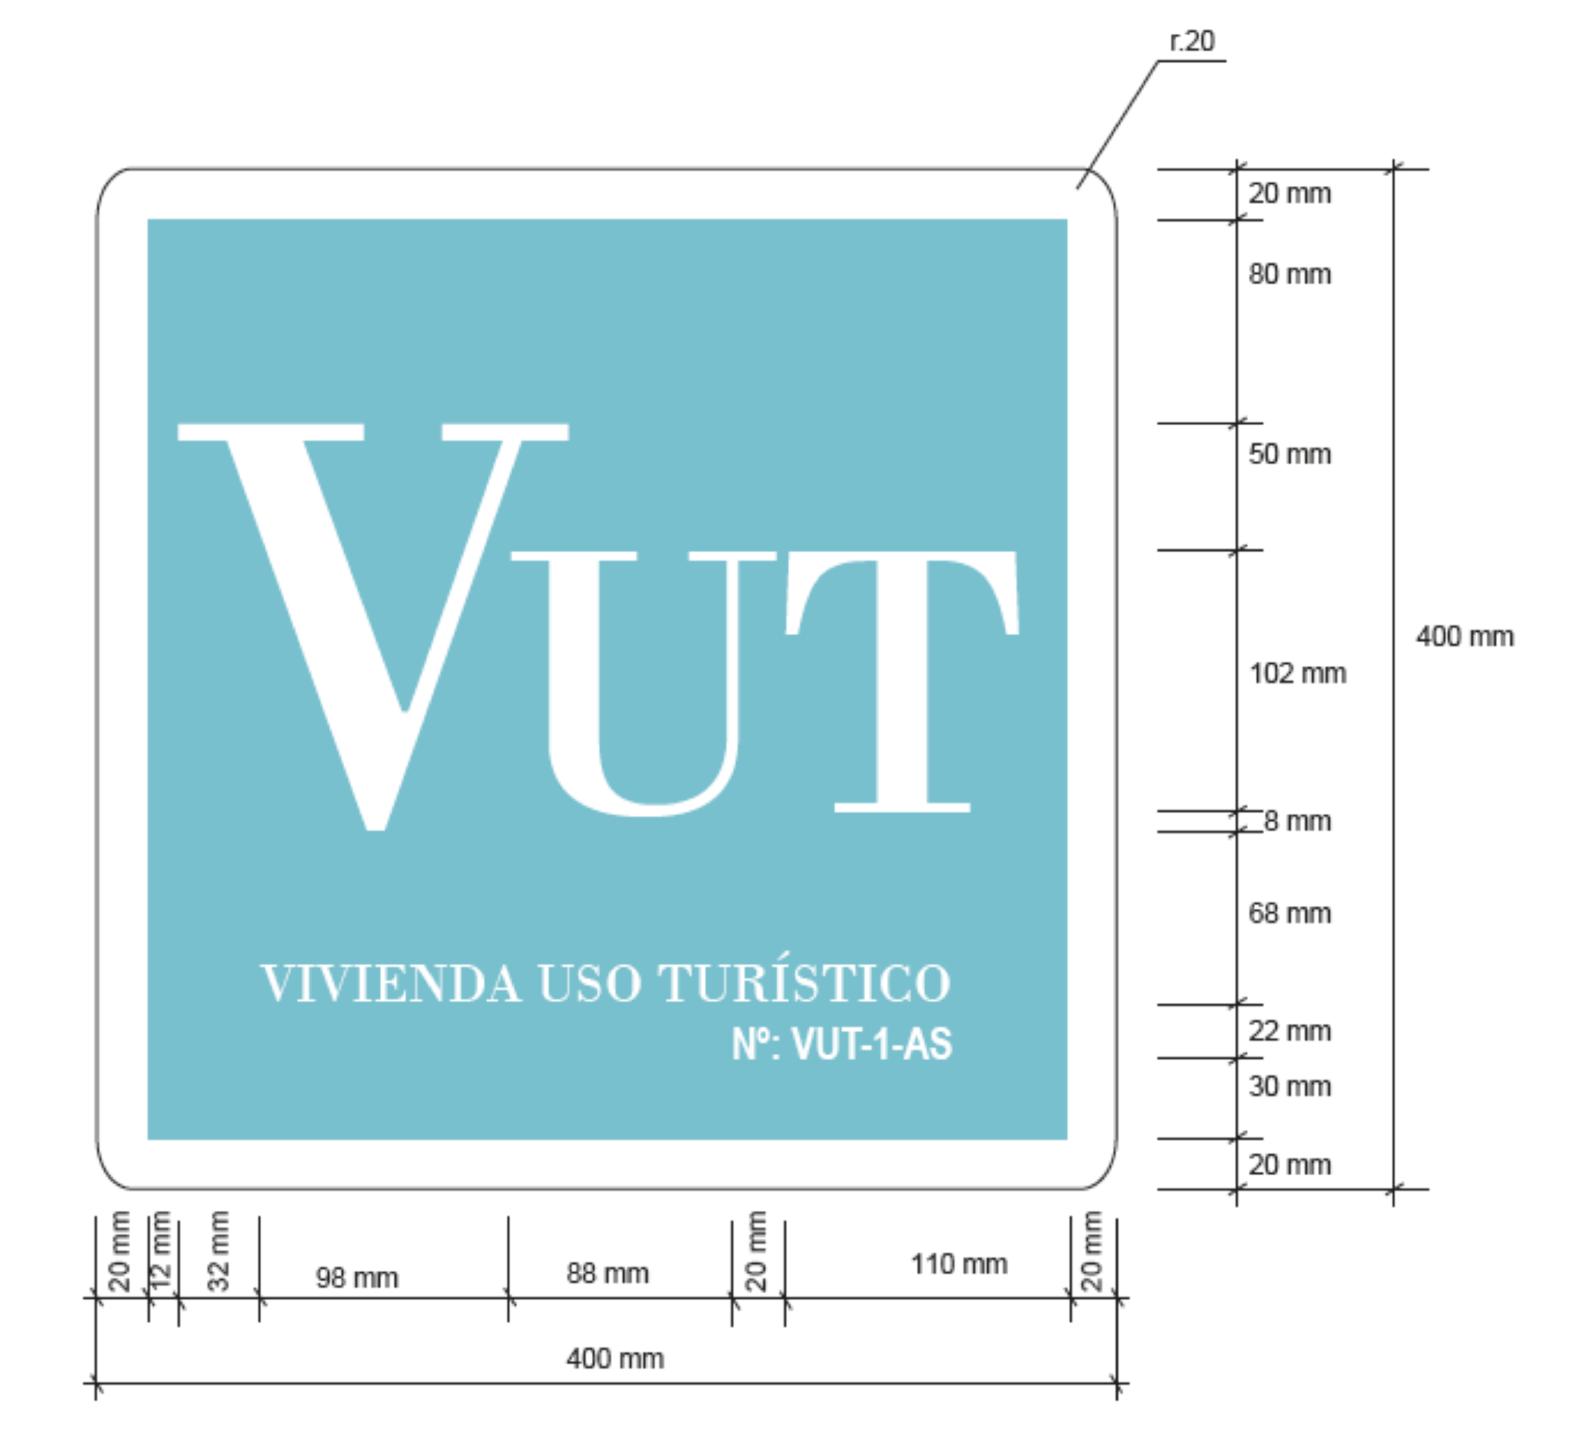 Placa identificativa · VUT · Asturias